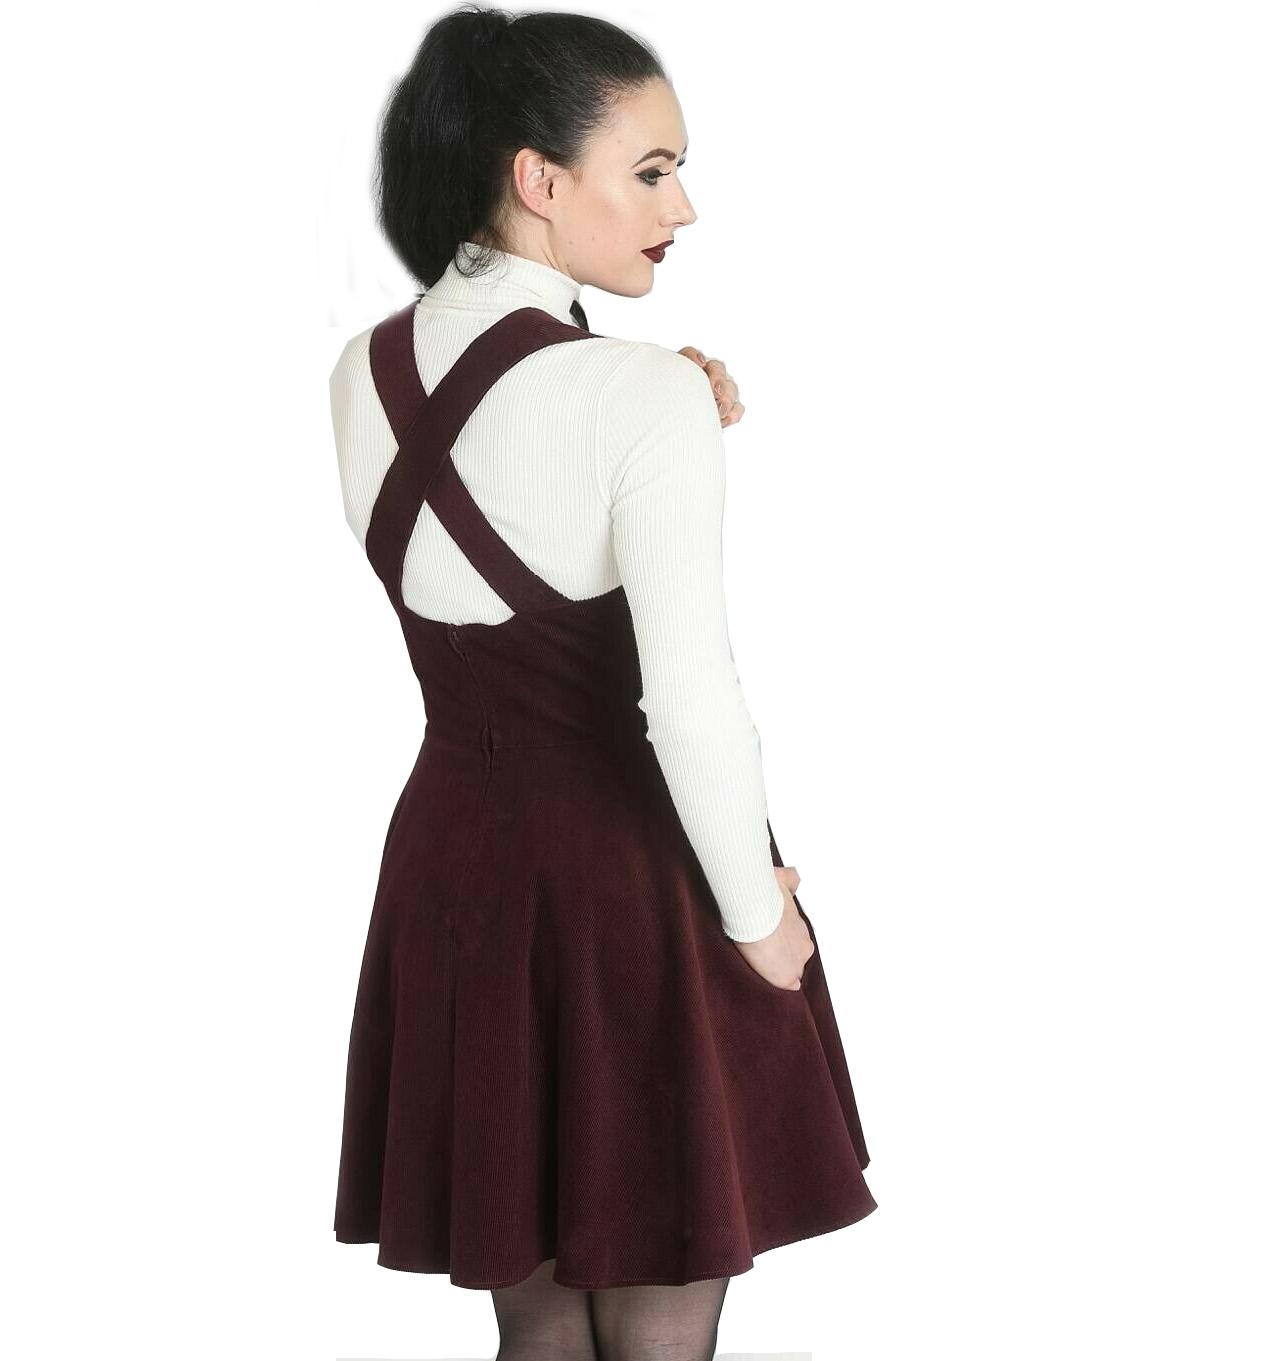 Hell-Bunny-Rockabilly-Corduroy-Mini-Dress-WONDER-YEARS-Pinafore-Wine-All-Sizes thumbnail 9